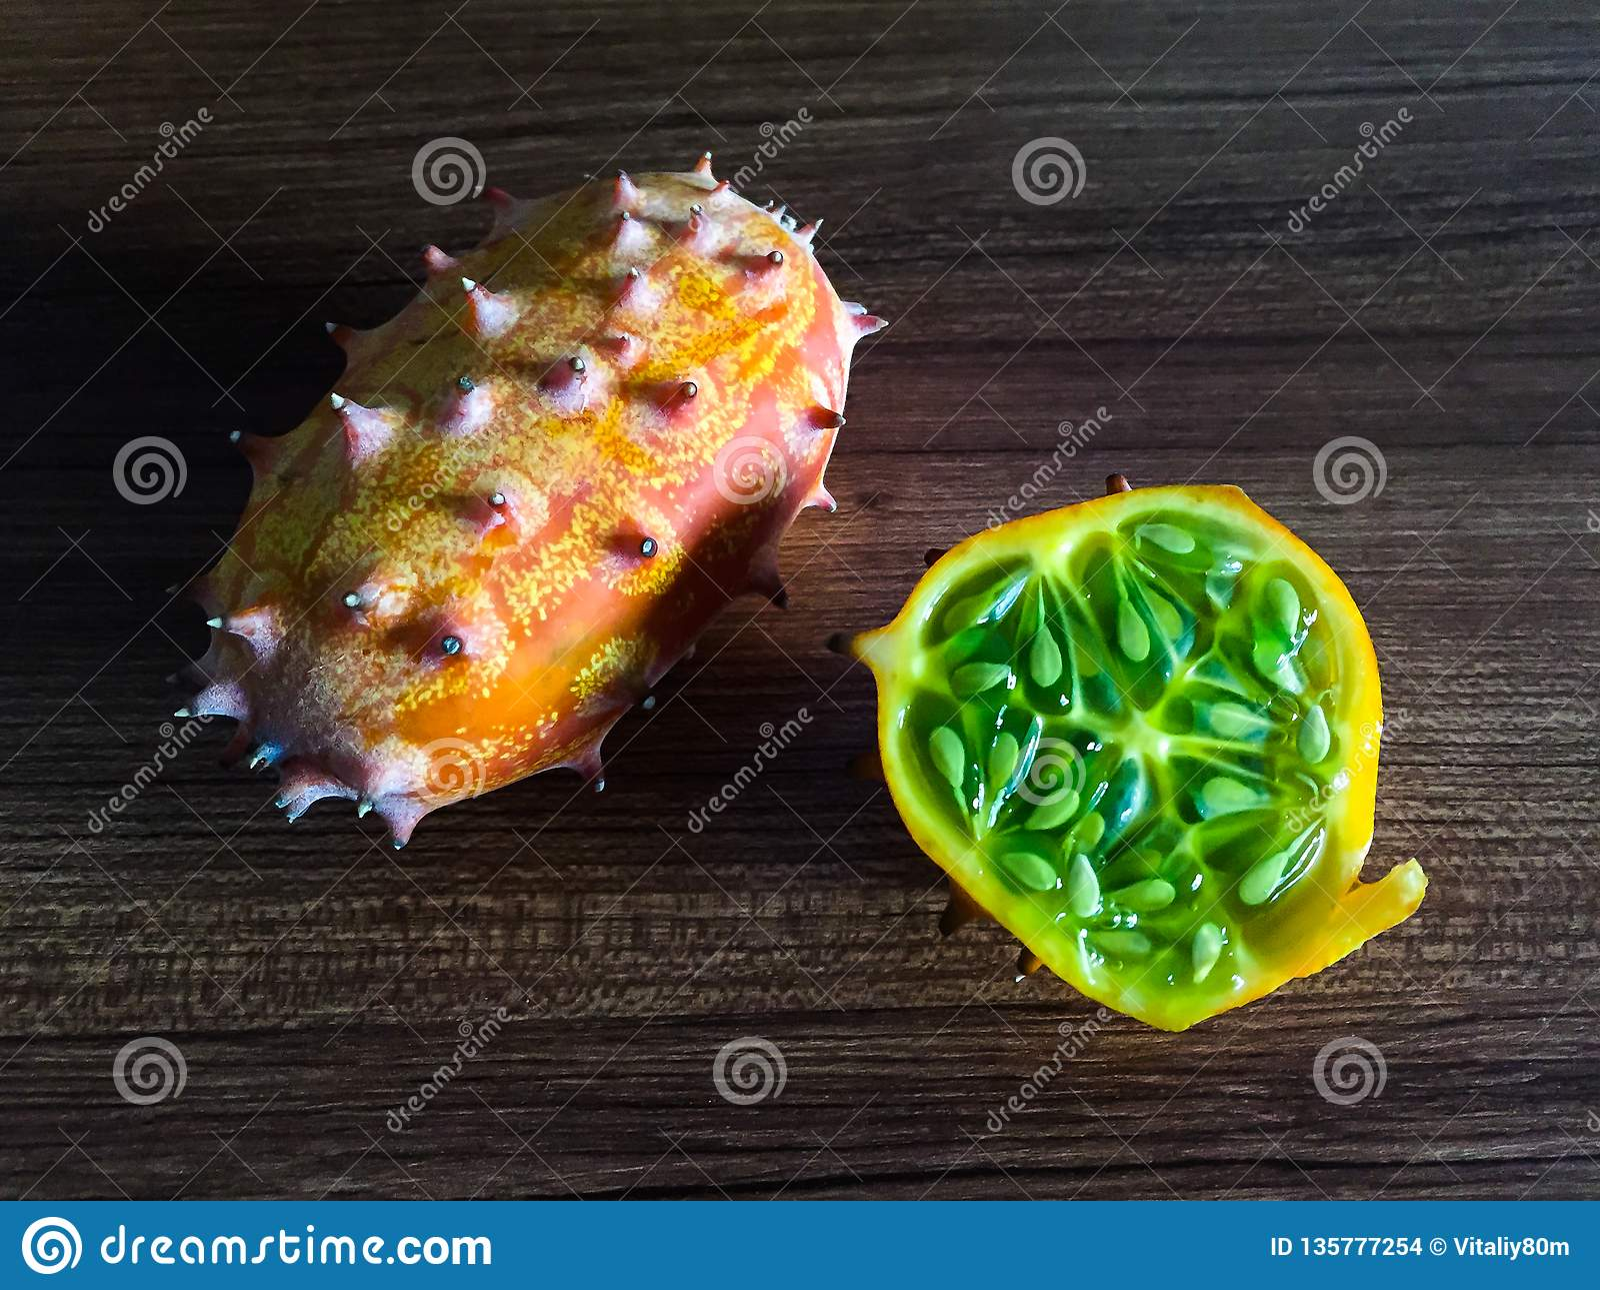 Kiwano horned melon on the table